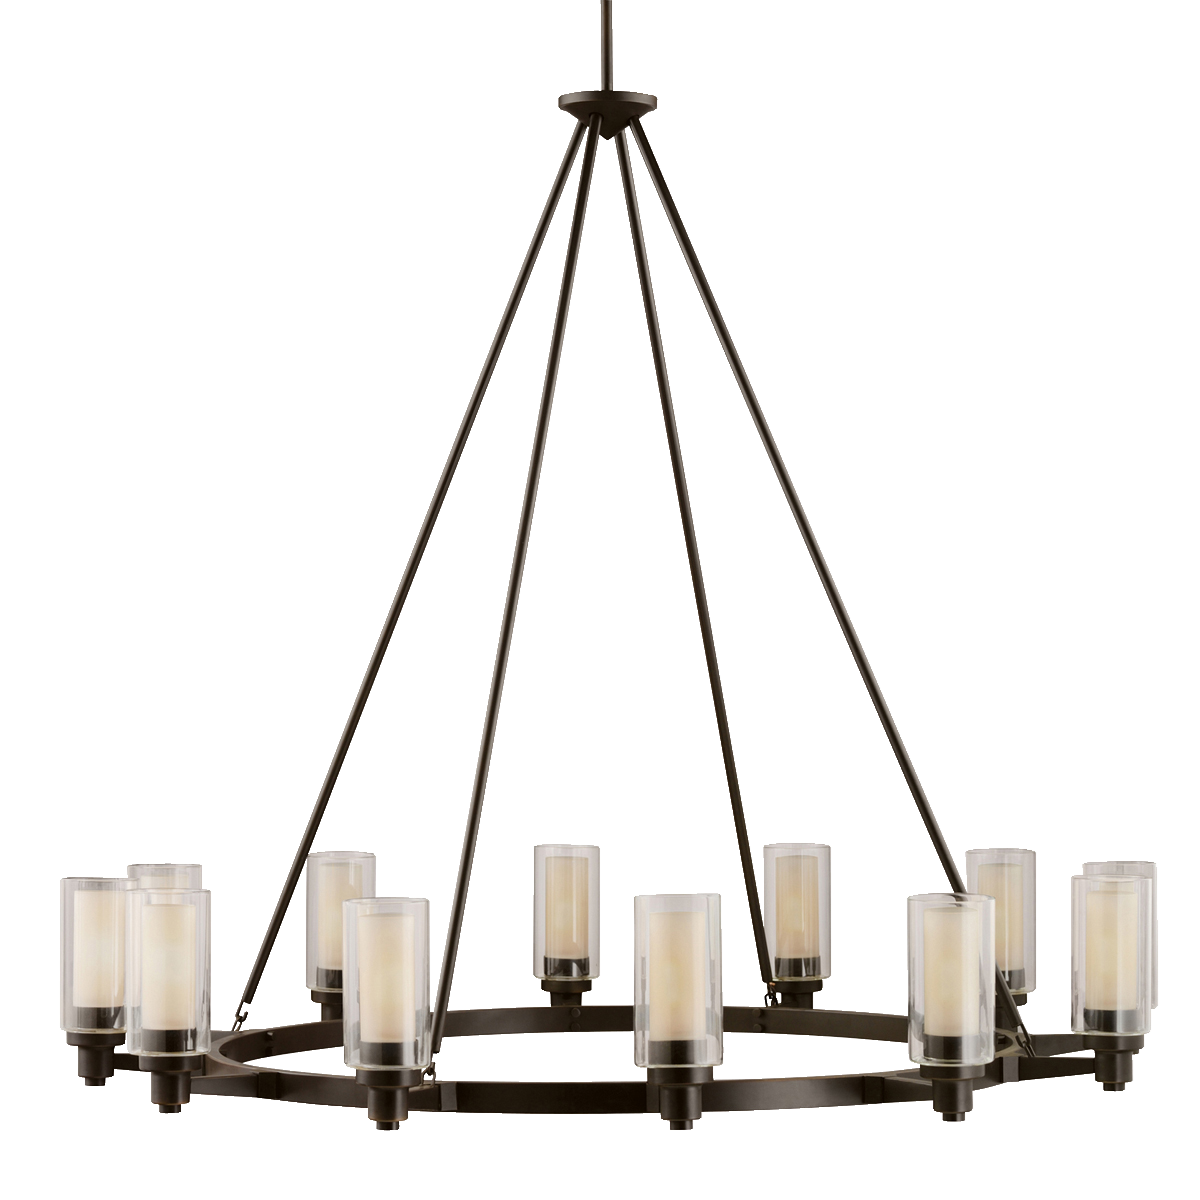 Circolo light chandelier in olde bronze oz bronze finishes